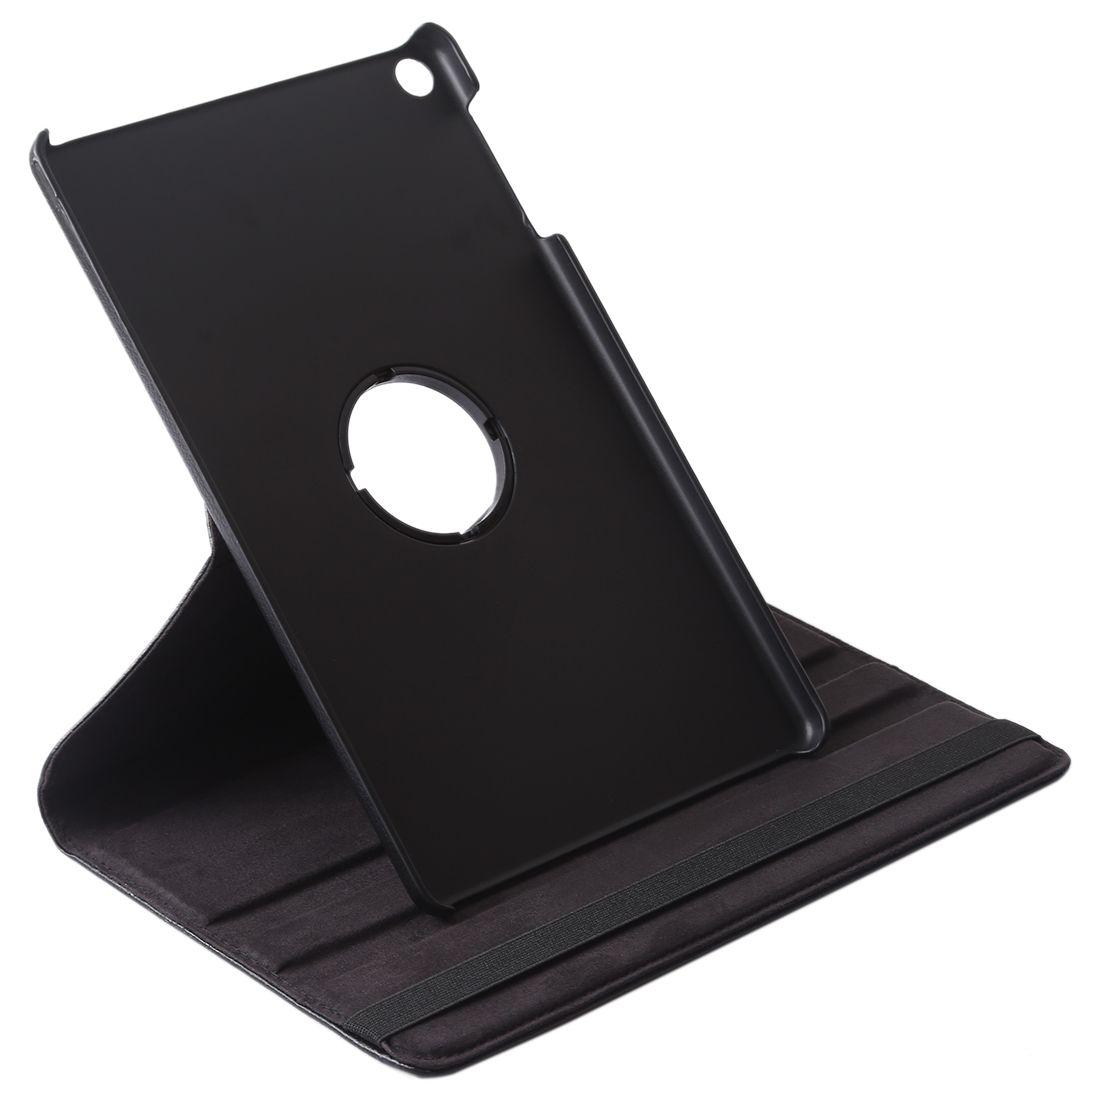 Kit Capa Tablet Samsung Galaxy Tab A 10.1 T510 T515 Giratória + Película de Vidro